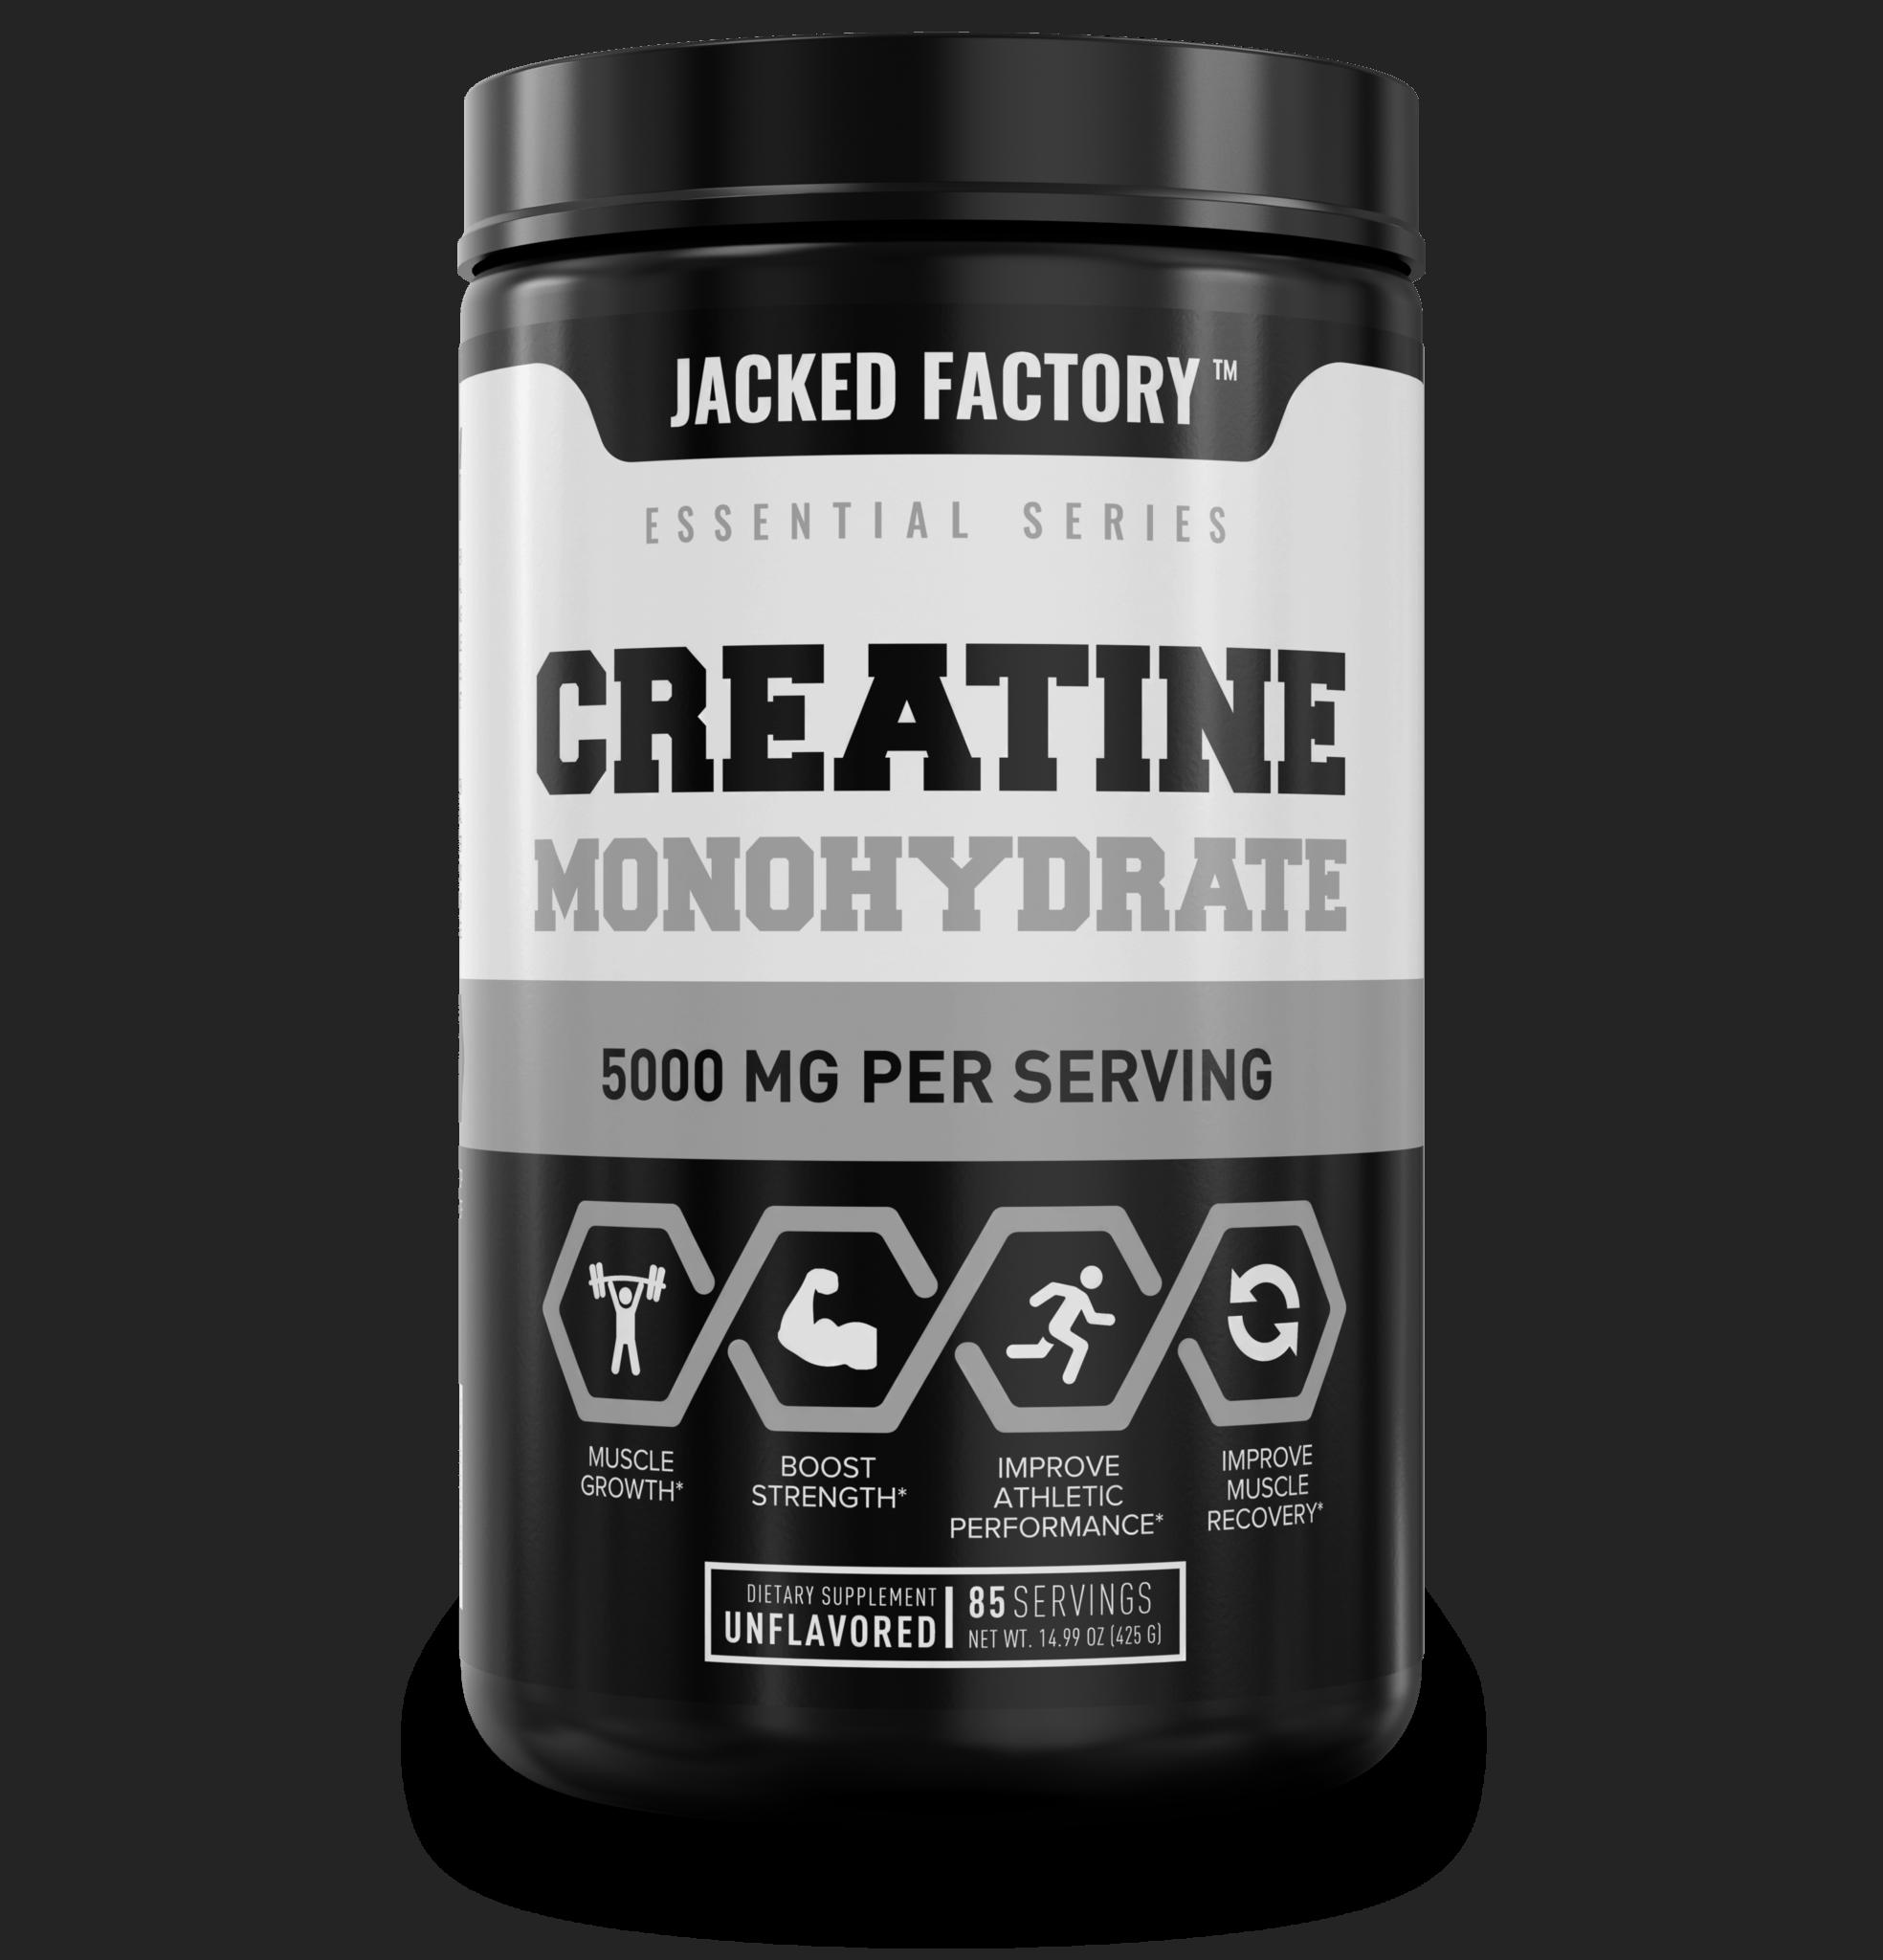 Jacked Factory Creatine Monohydrate